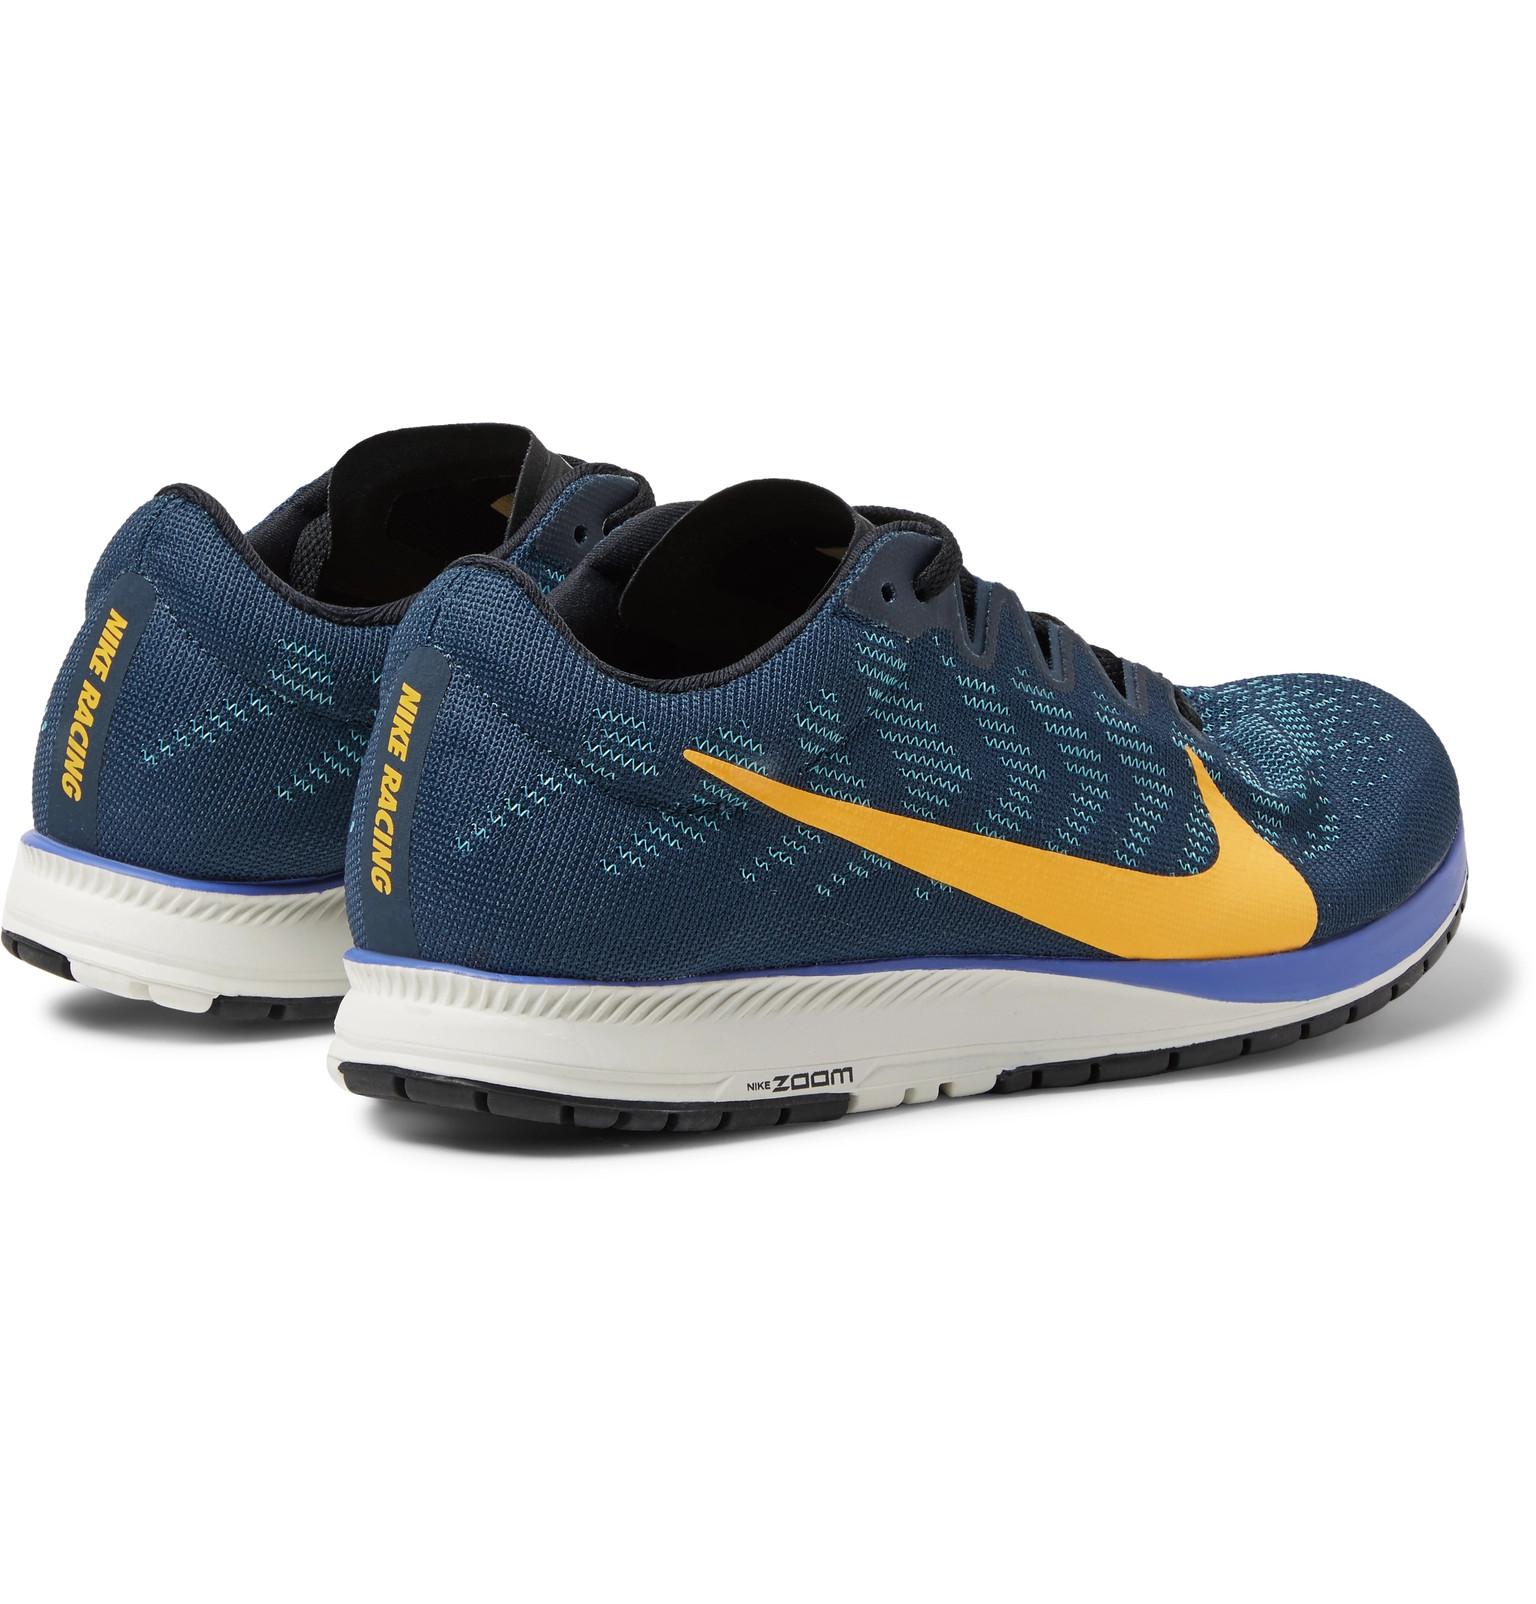 0e602810d0b Nike Running - Air Zoom Streak 7 Mesh Running Sneakers